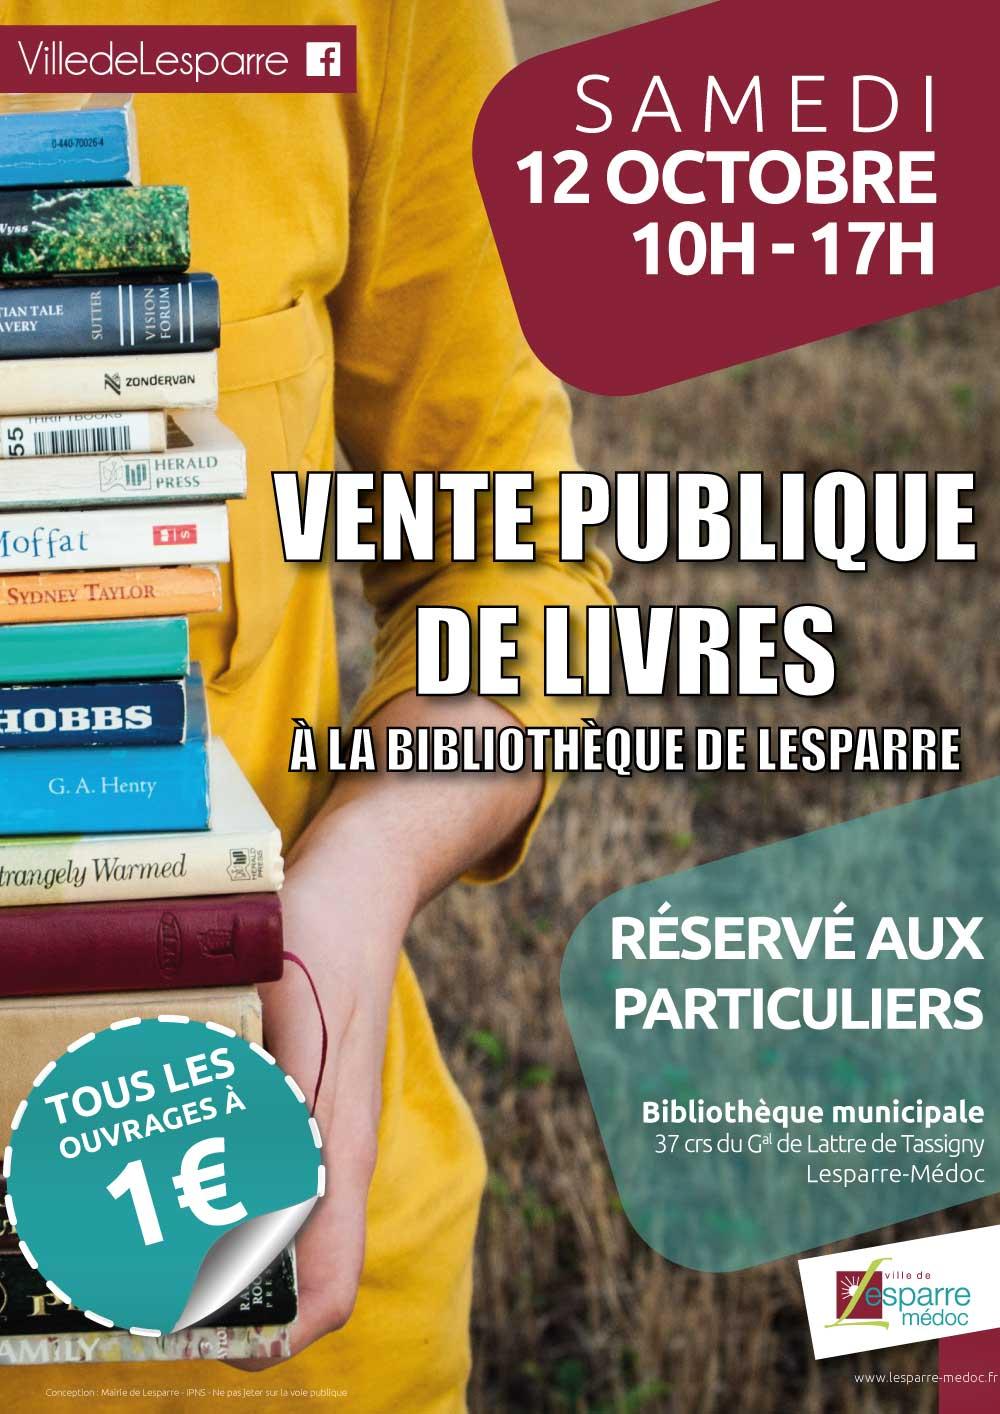 2019.10.12---Desherbage-bibliothèque_V1.0